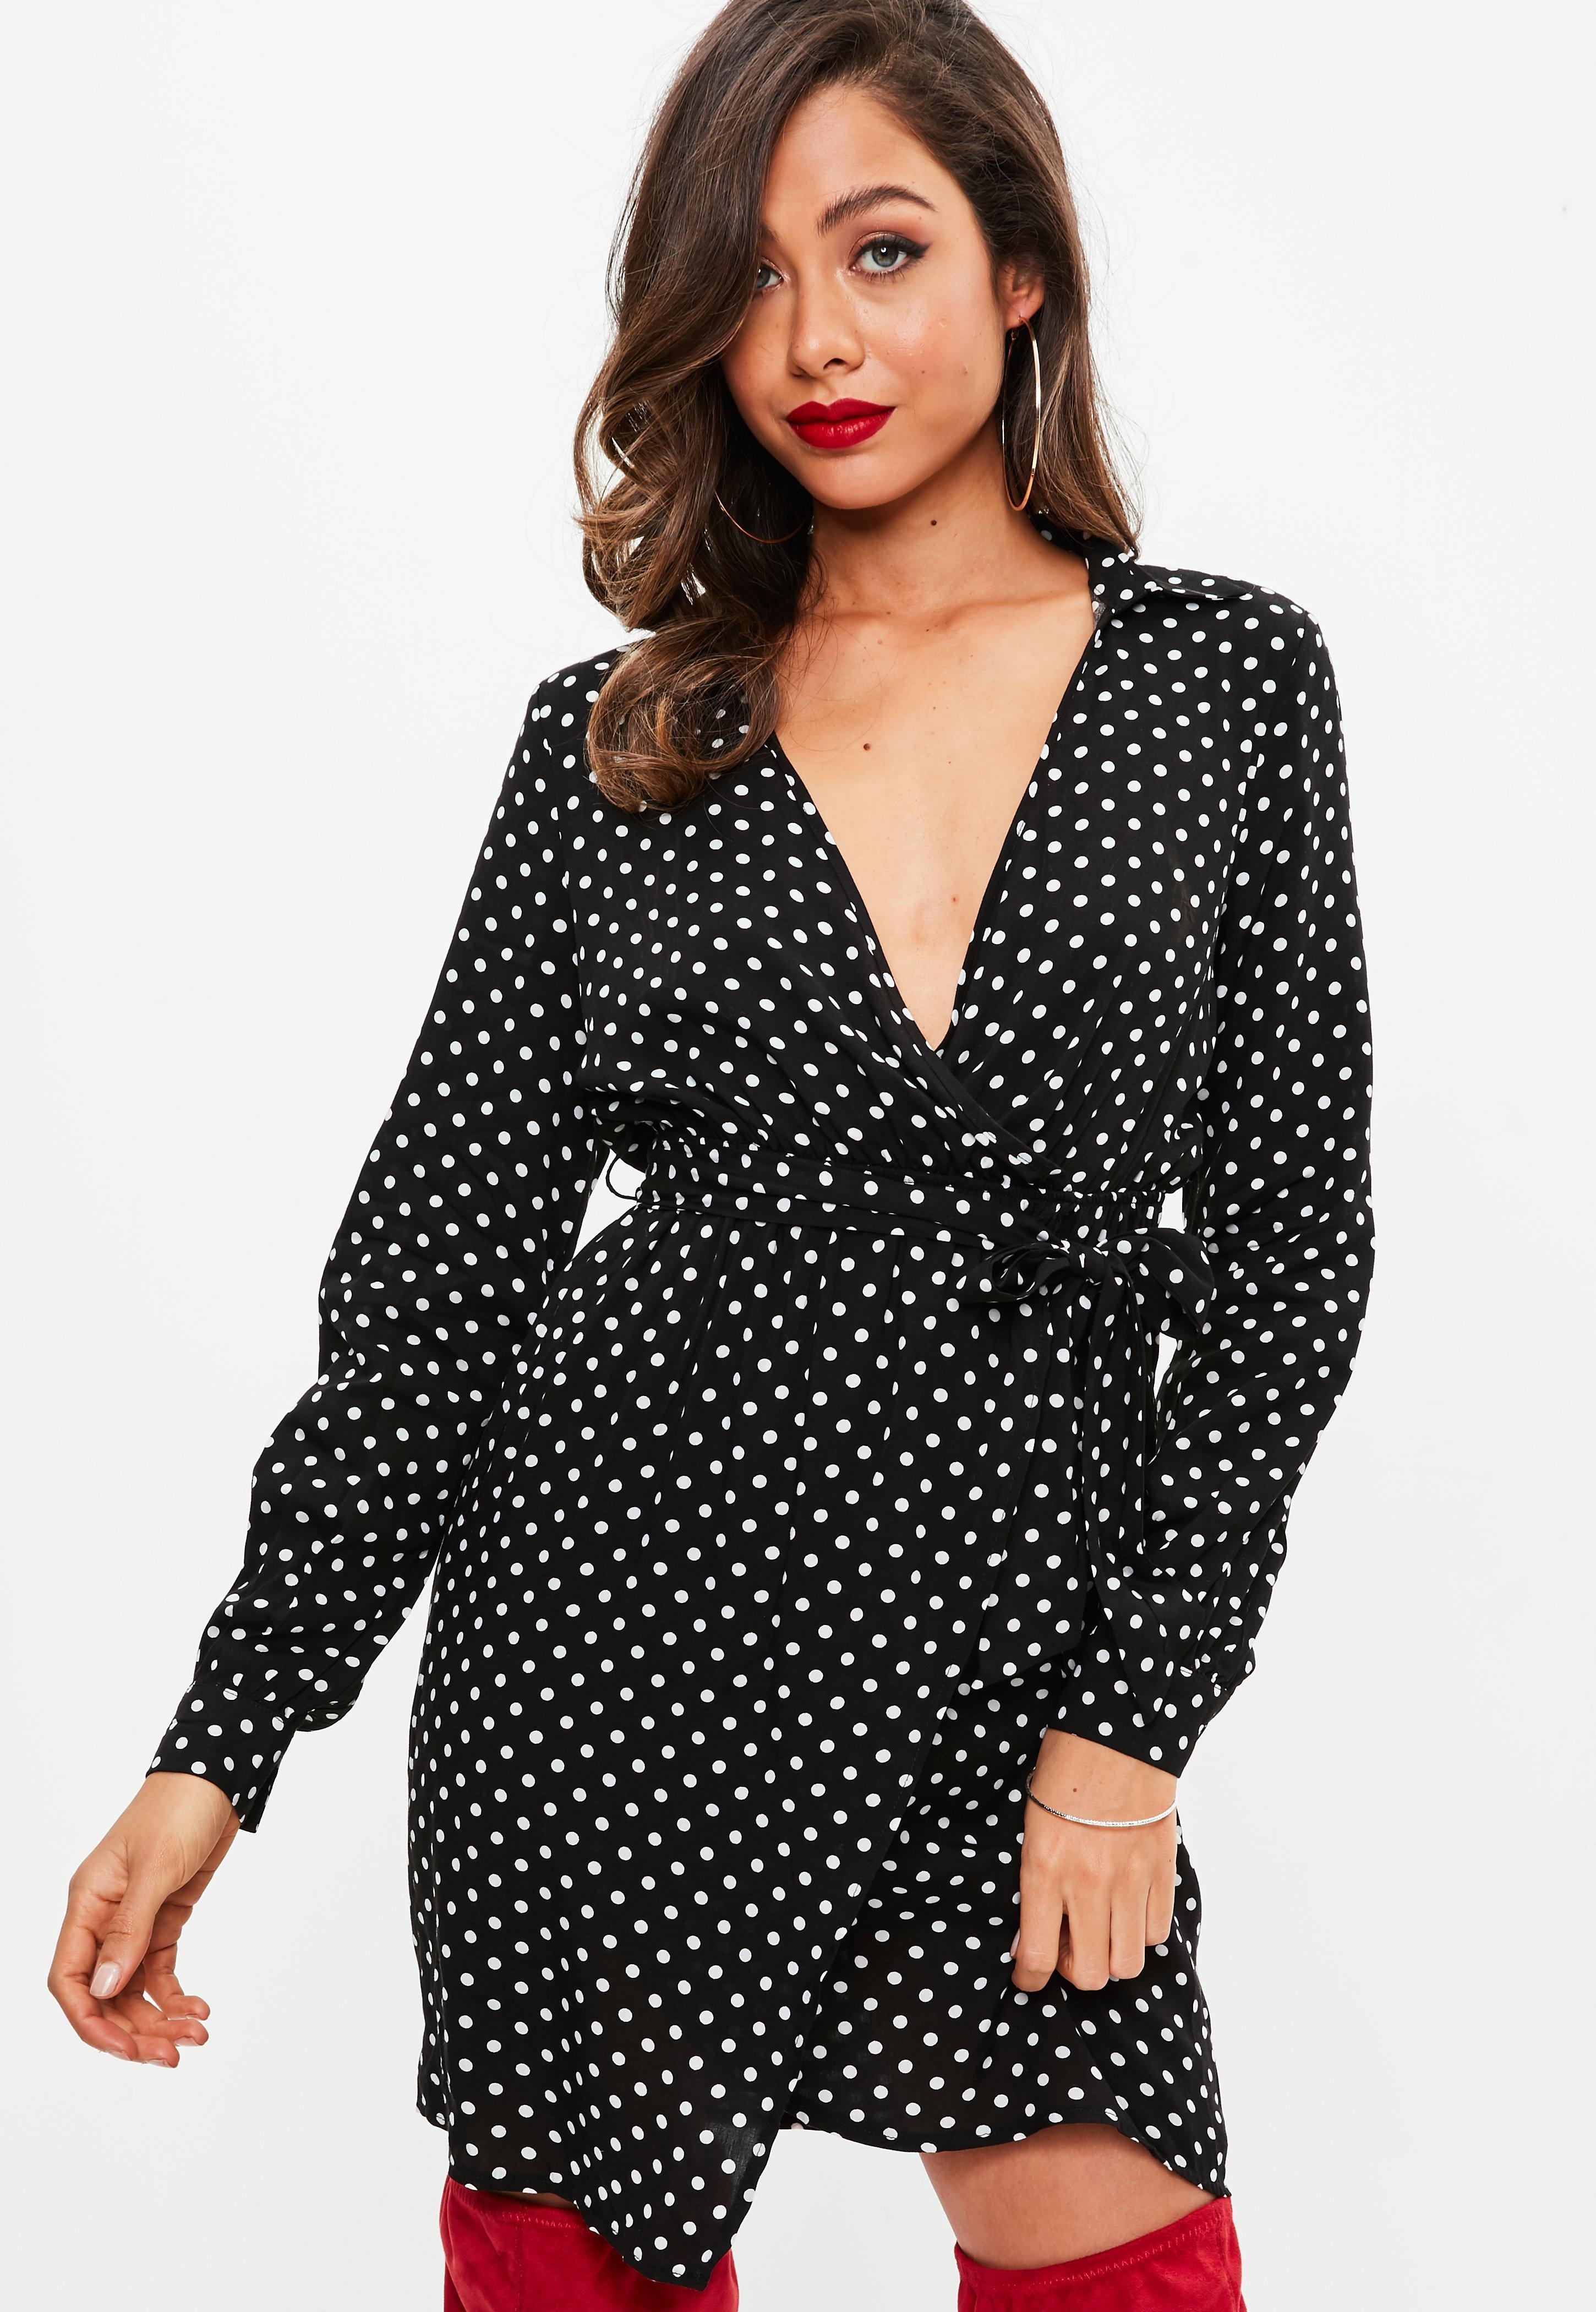 Black mini dresses uk websites